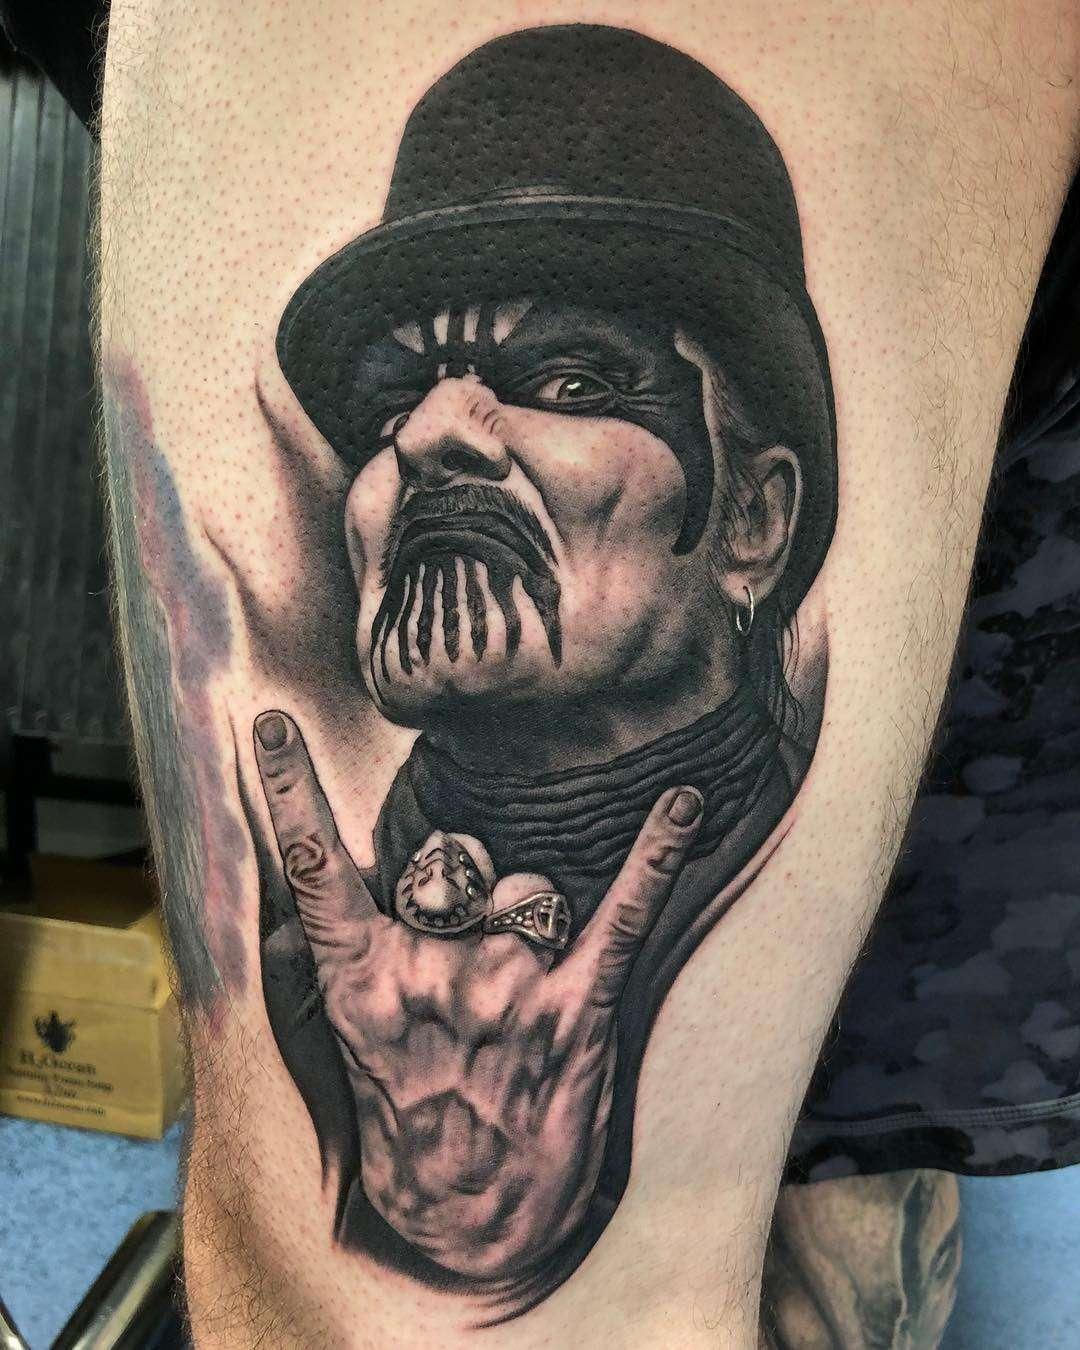 Musician And Tattoo Artist Bob Tyrrell